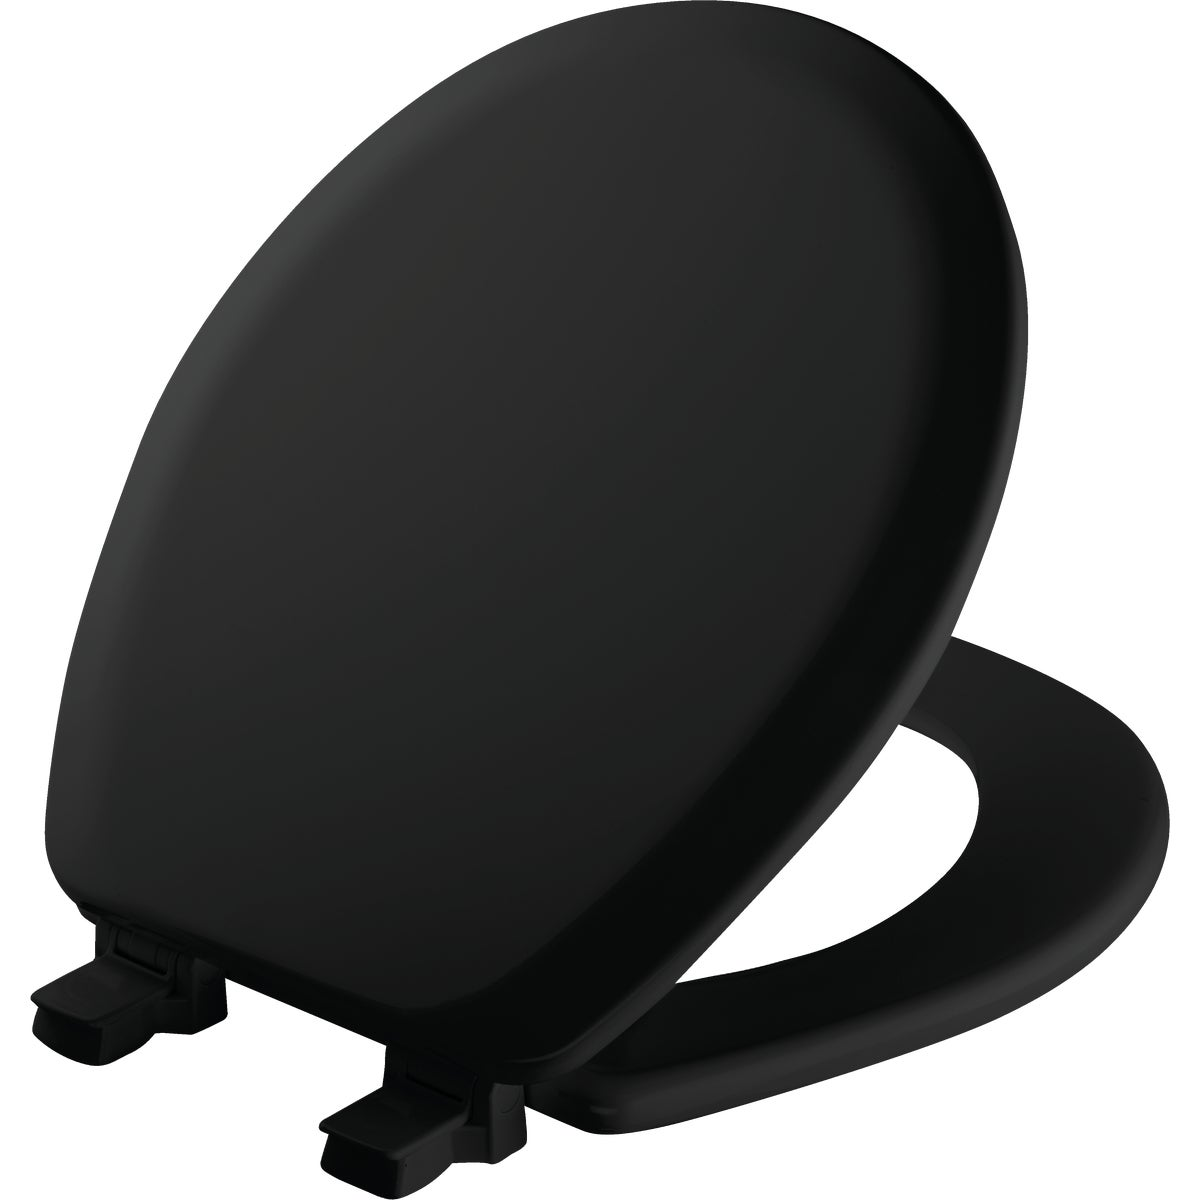 BLACK WOOD ROUND SEAT